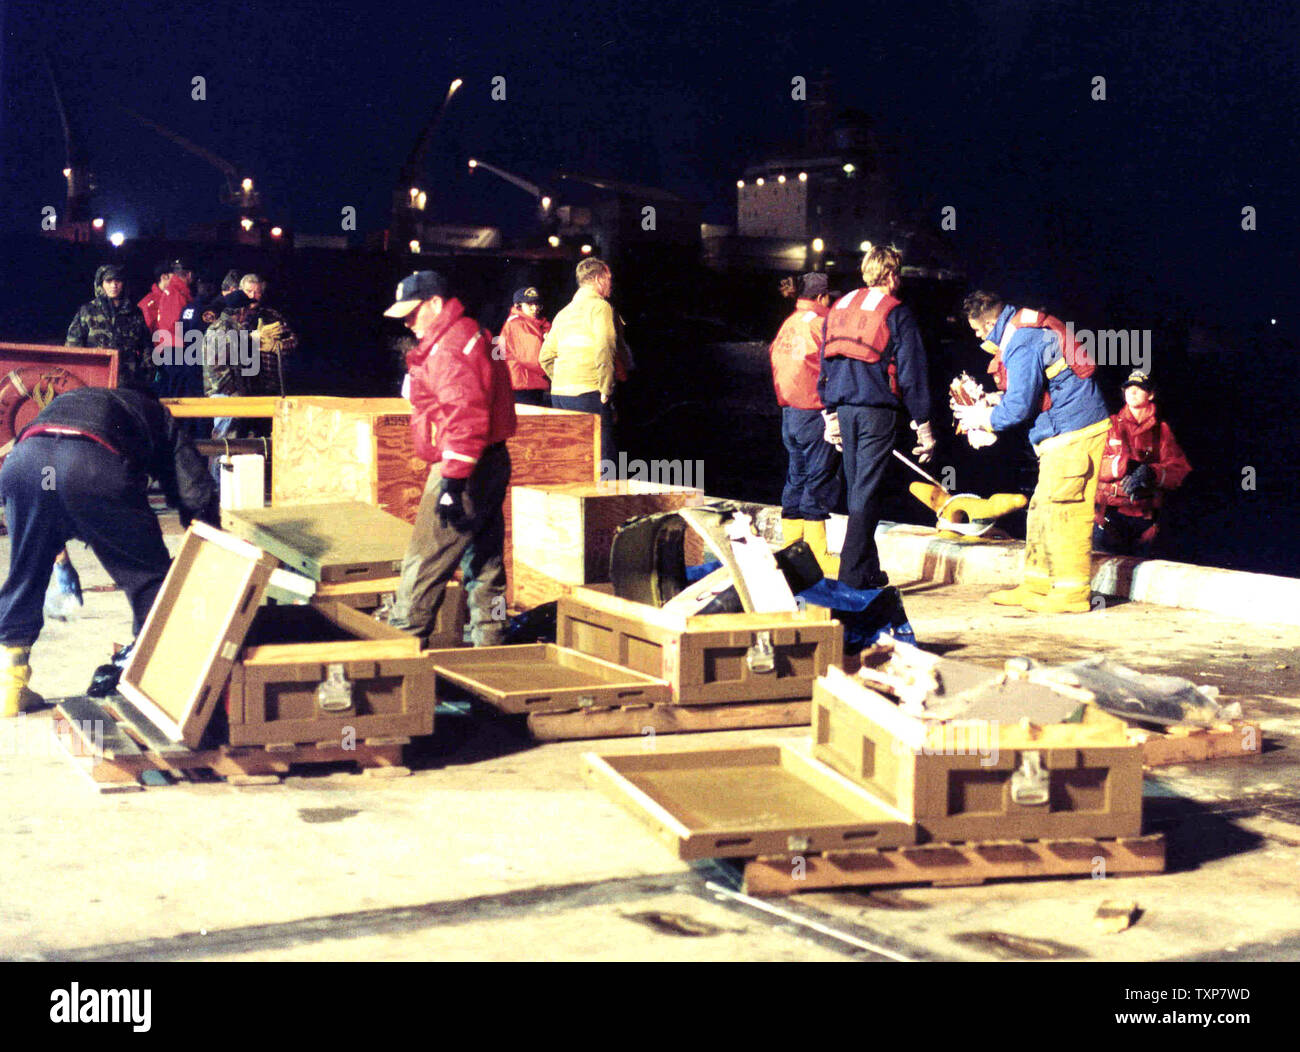 Naval Construction Battalion Center Stock Photos & Naval